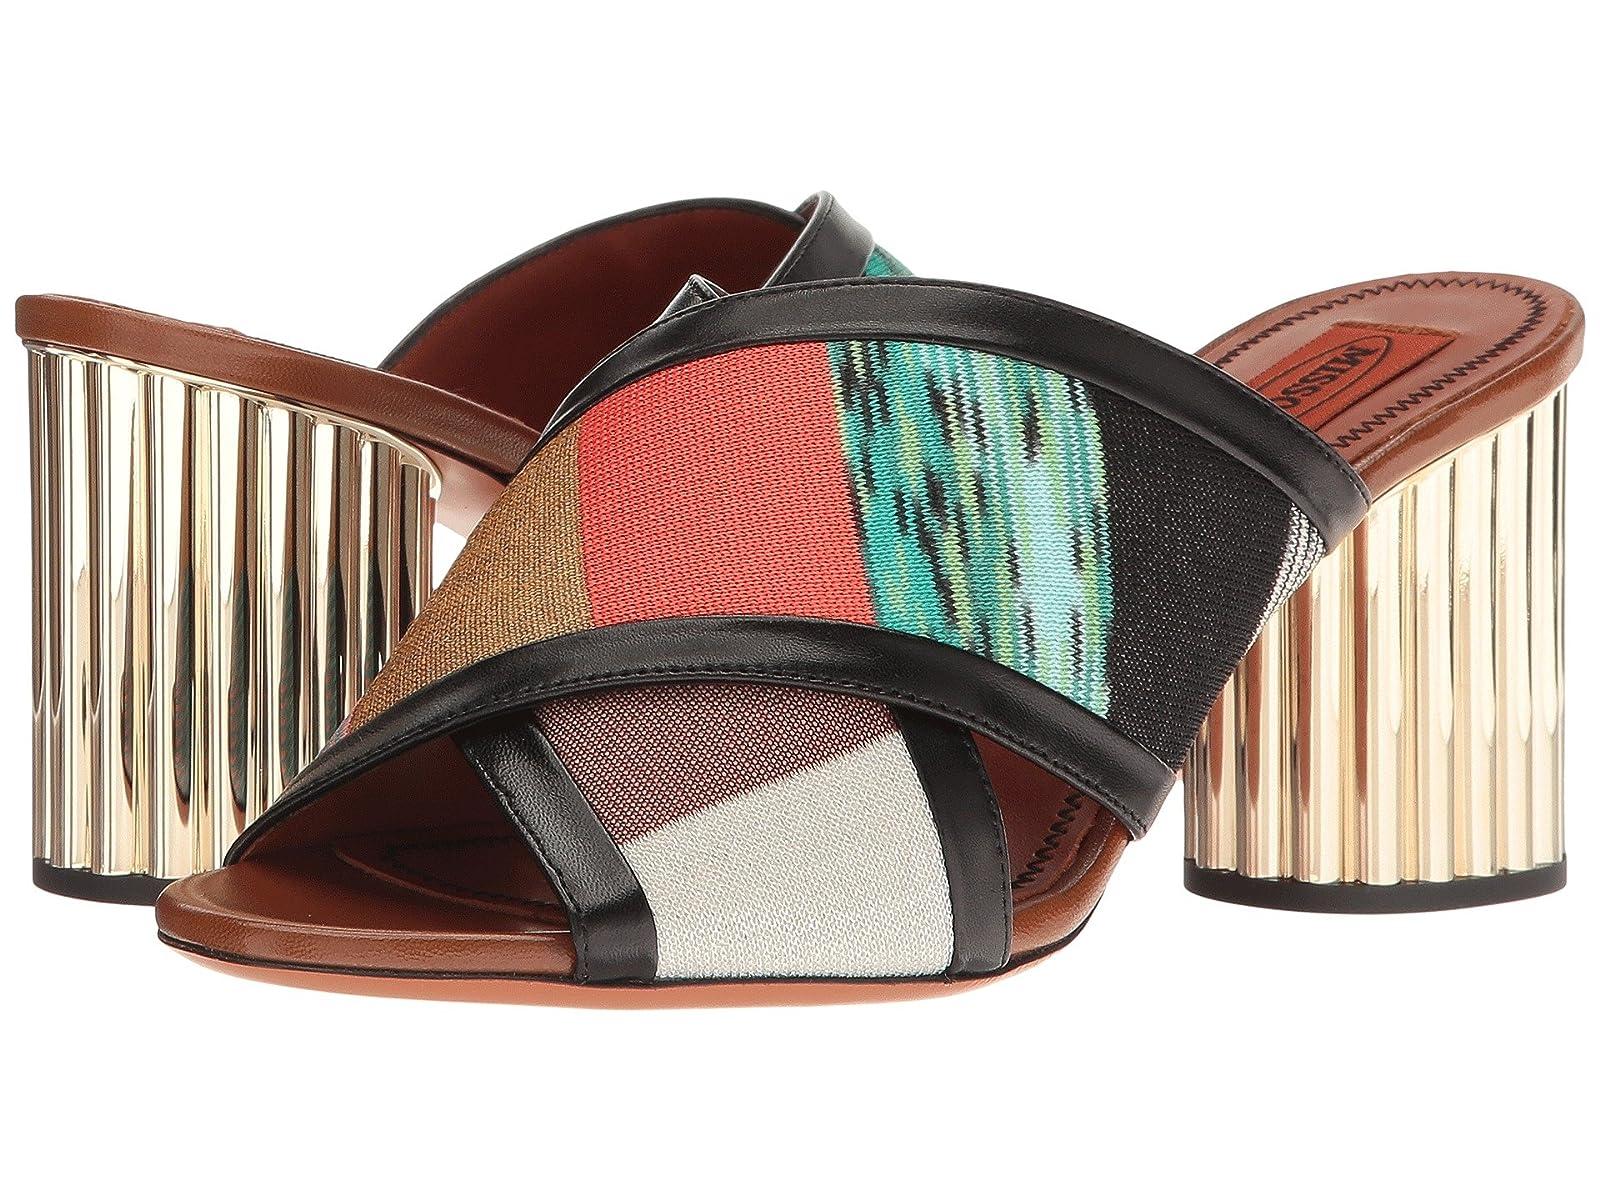 Missoni Patchwork Heeled SlideCheap and distinctive eye-catching shoes